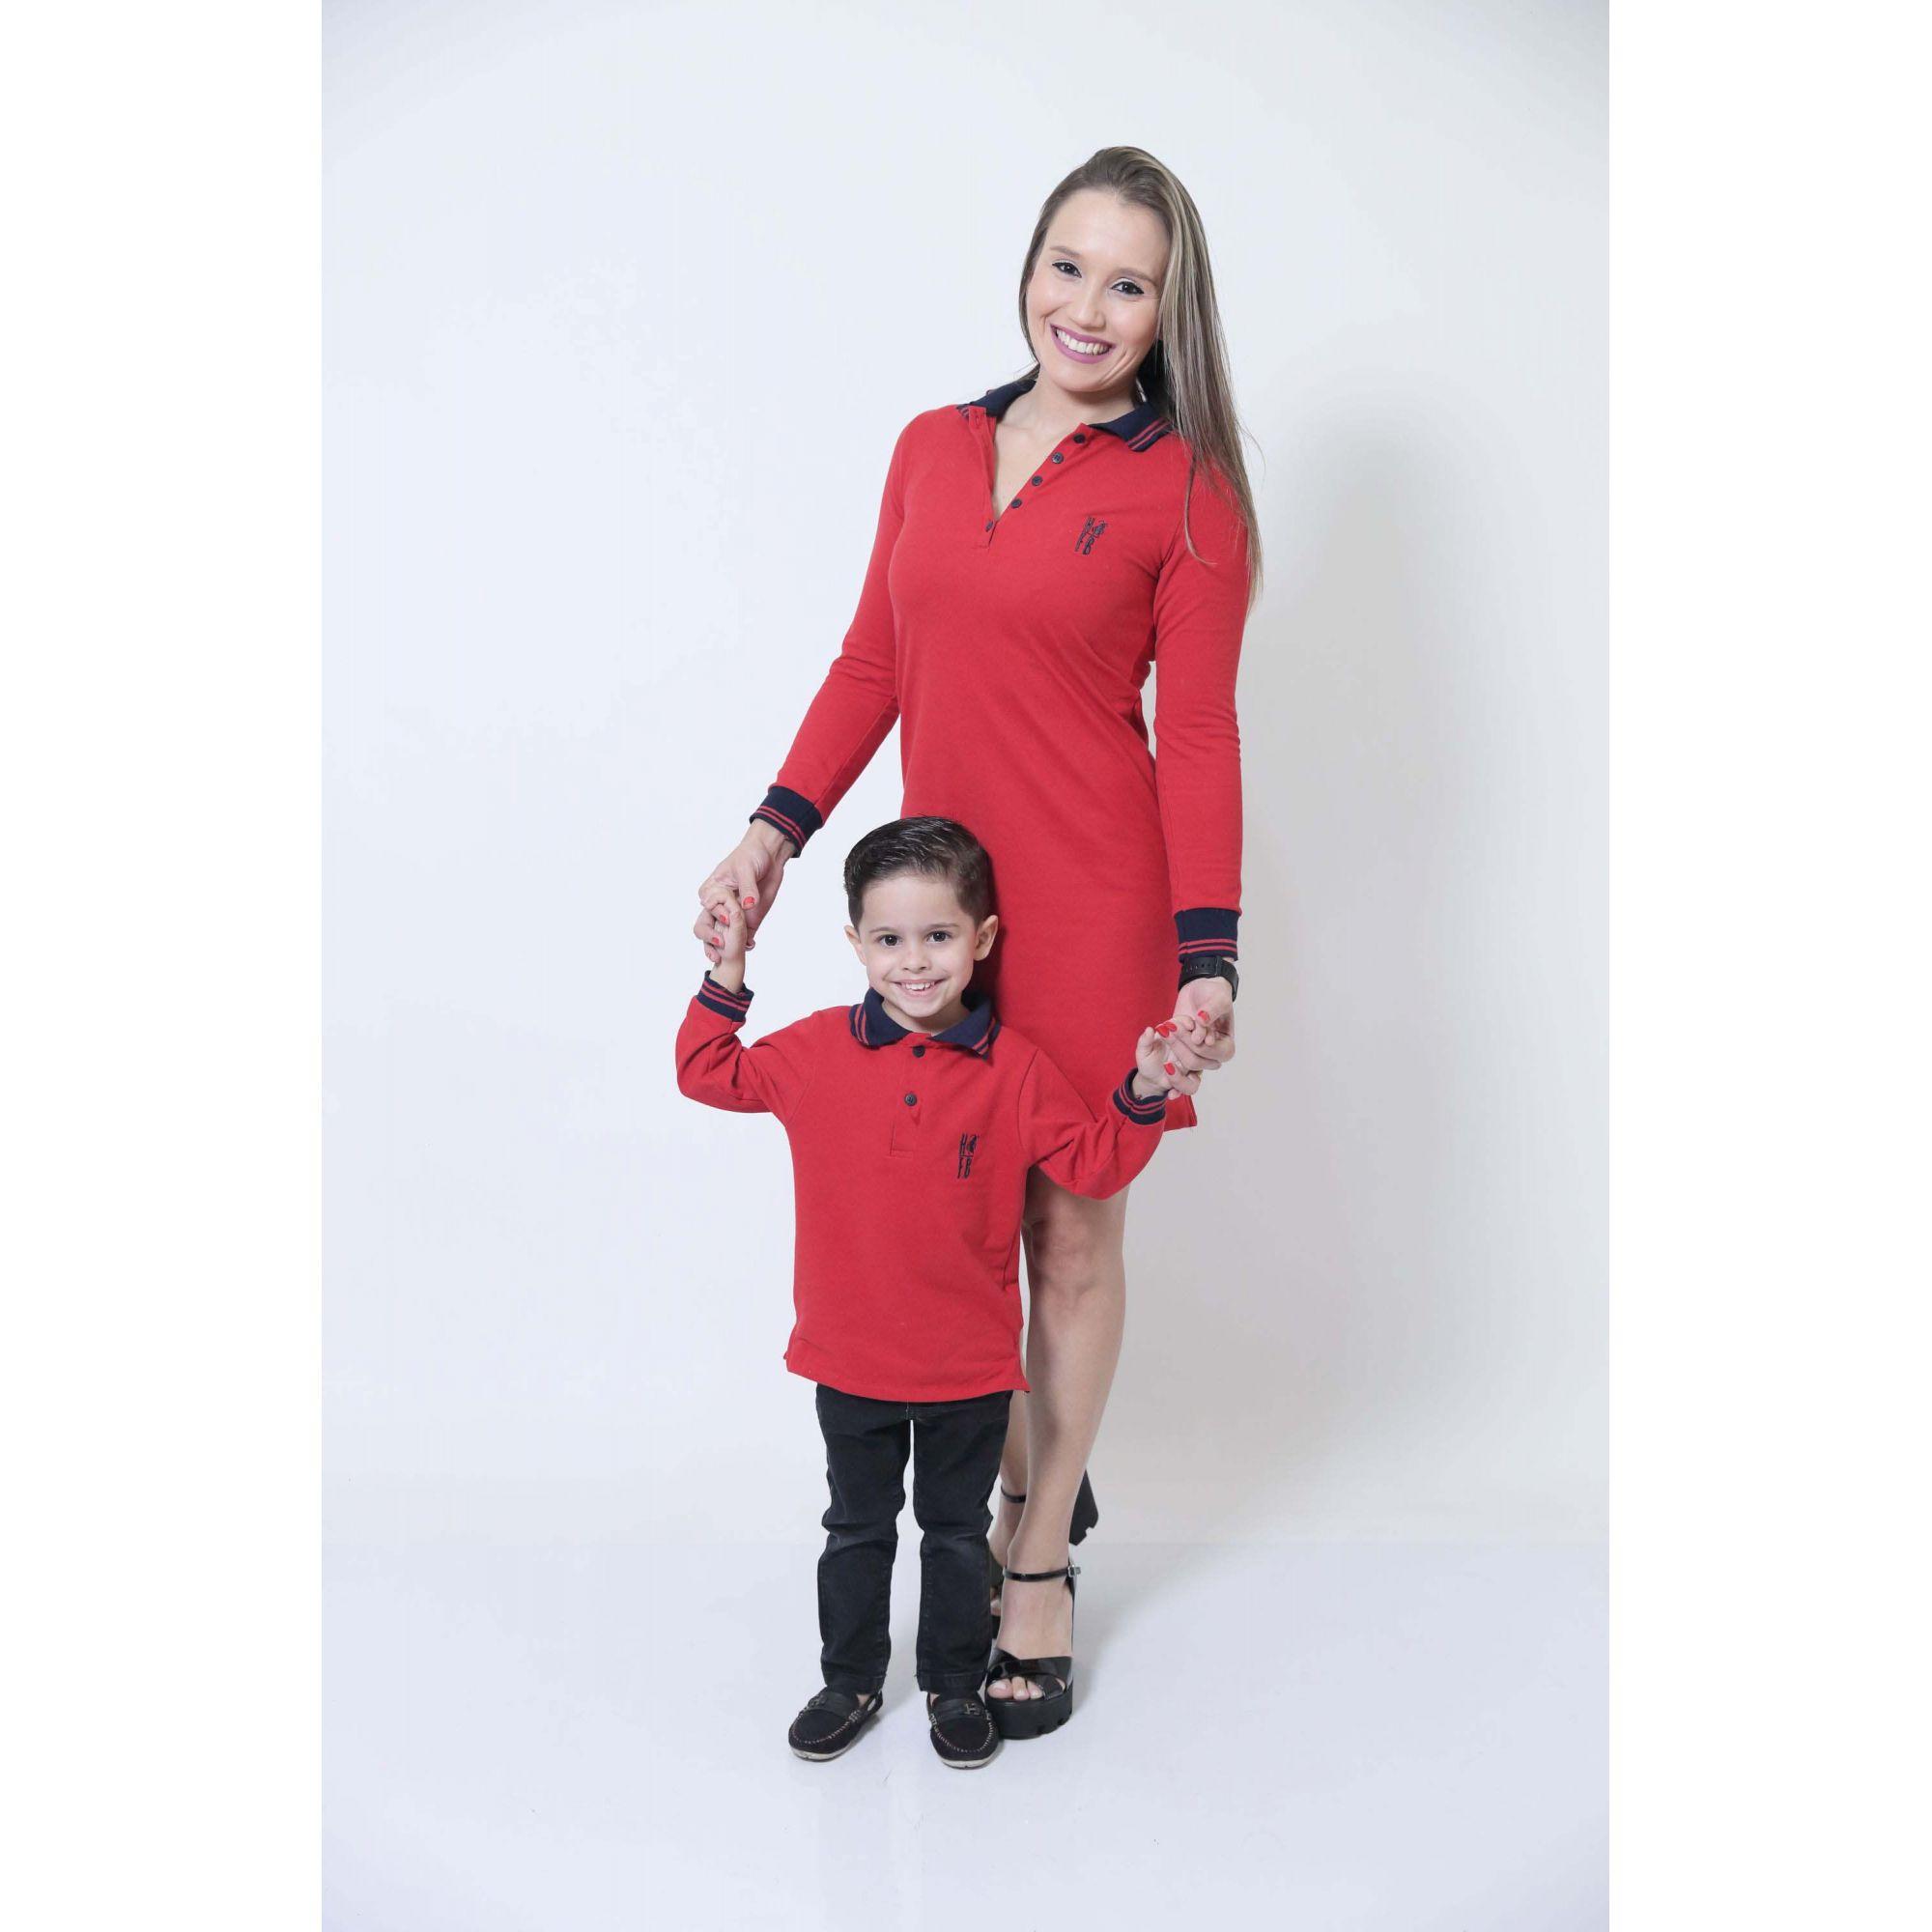 MÃE E FILHO > Kit 02 Peças Vestido + Camisa Polo ou Body Manga Longa Vermelho [Coleção Tal Mãe Tal Filho]  - Heitor Fashion Brazil